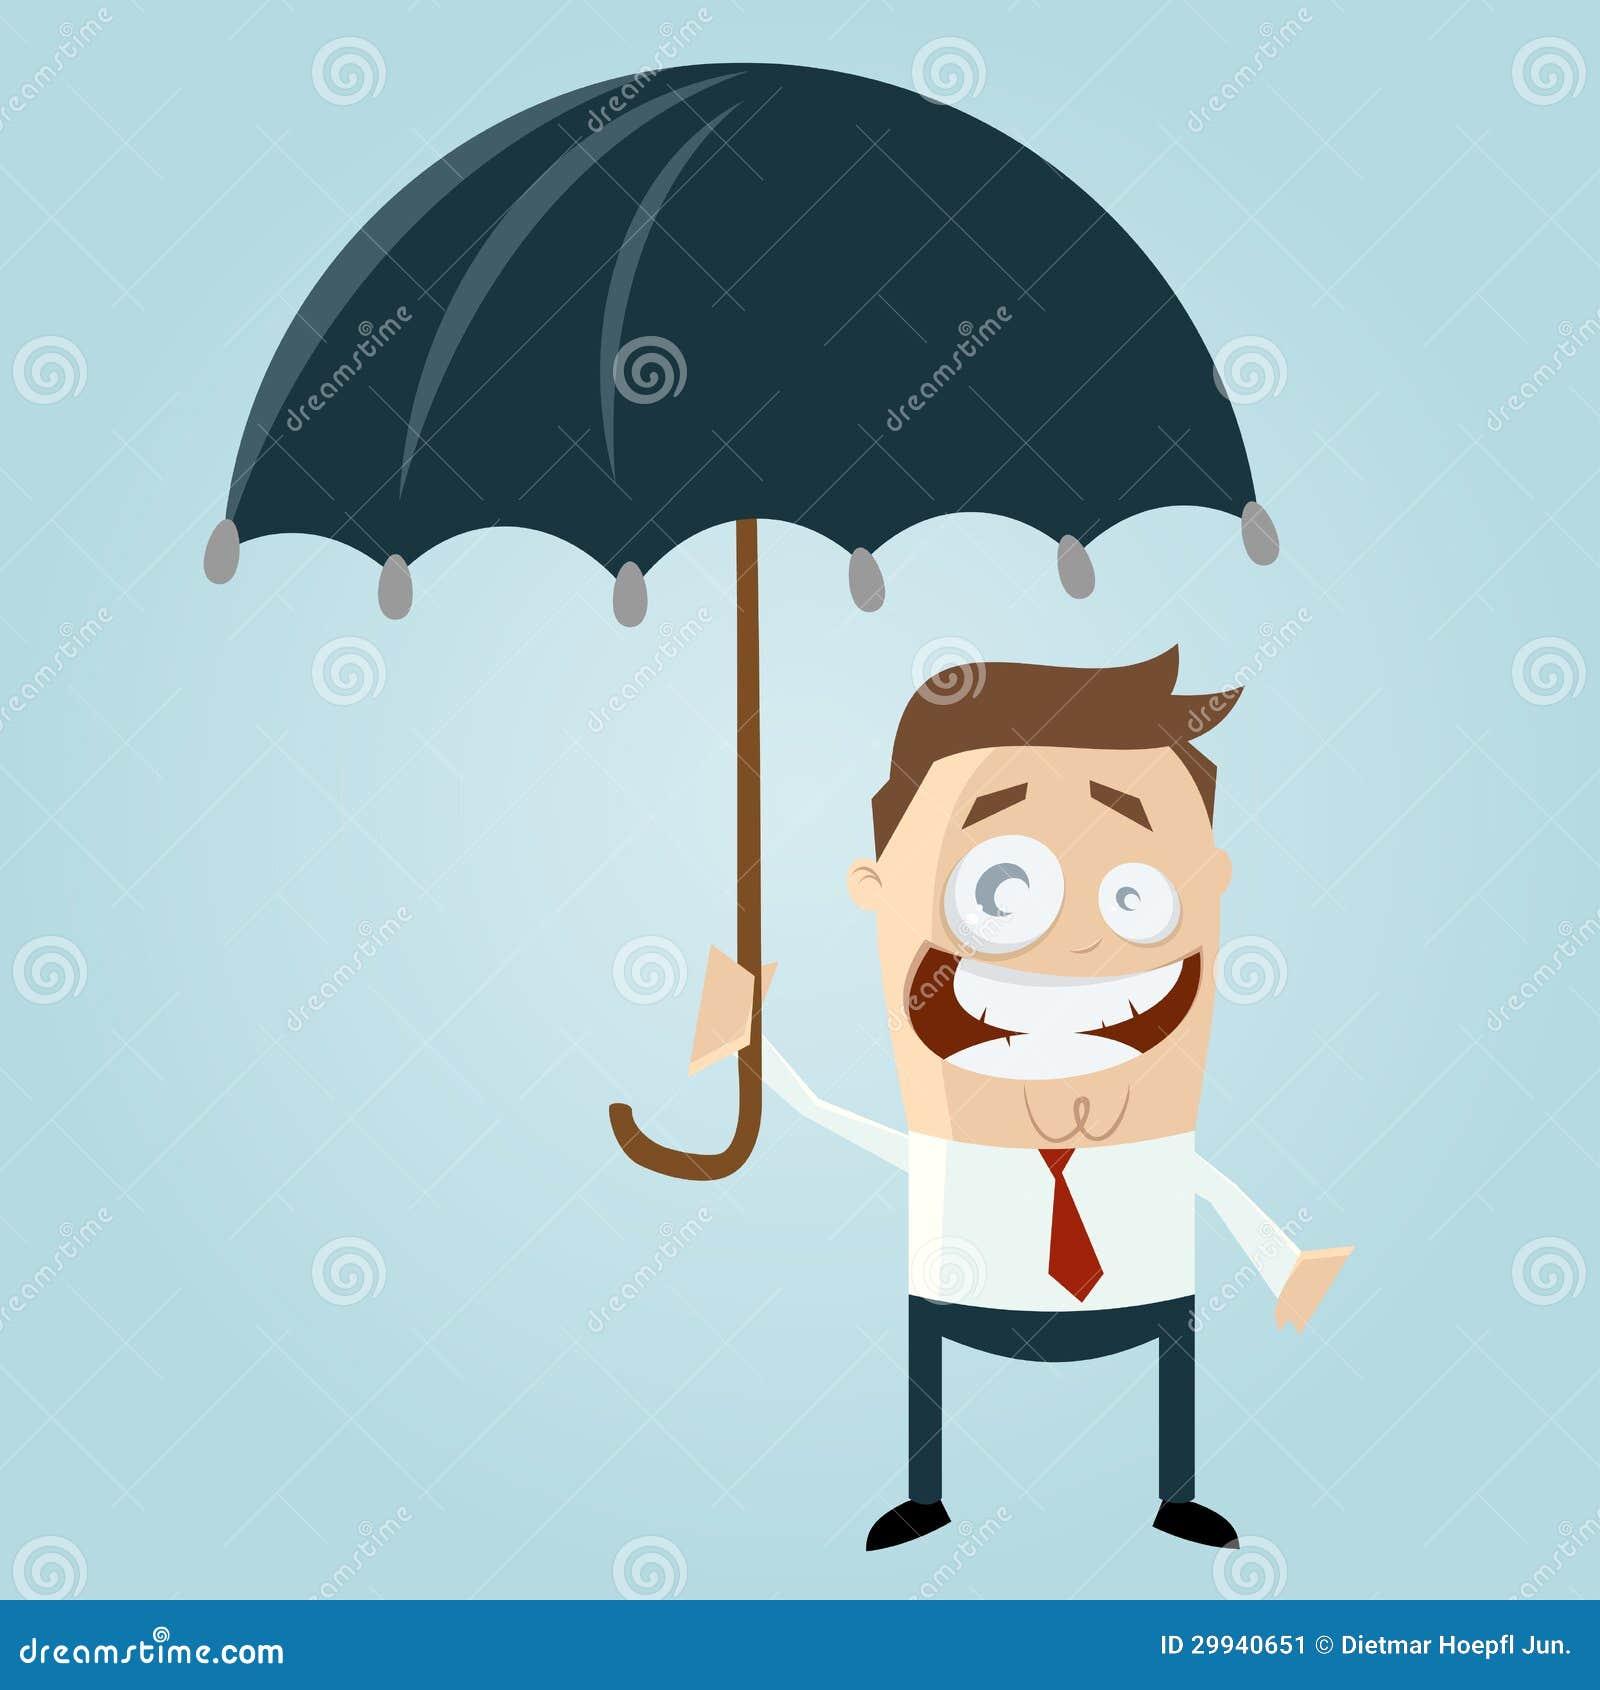 cartoon man with umbrella stock image image 29940651